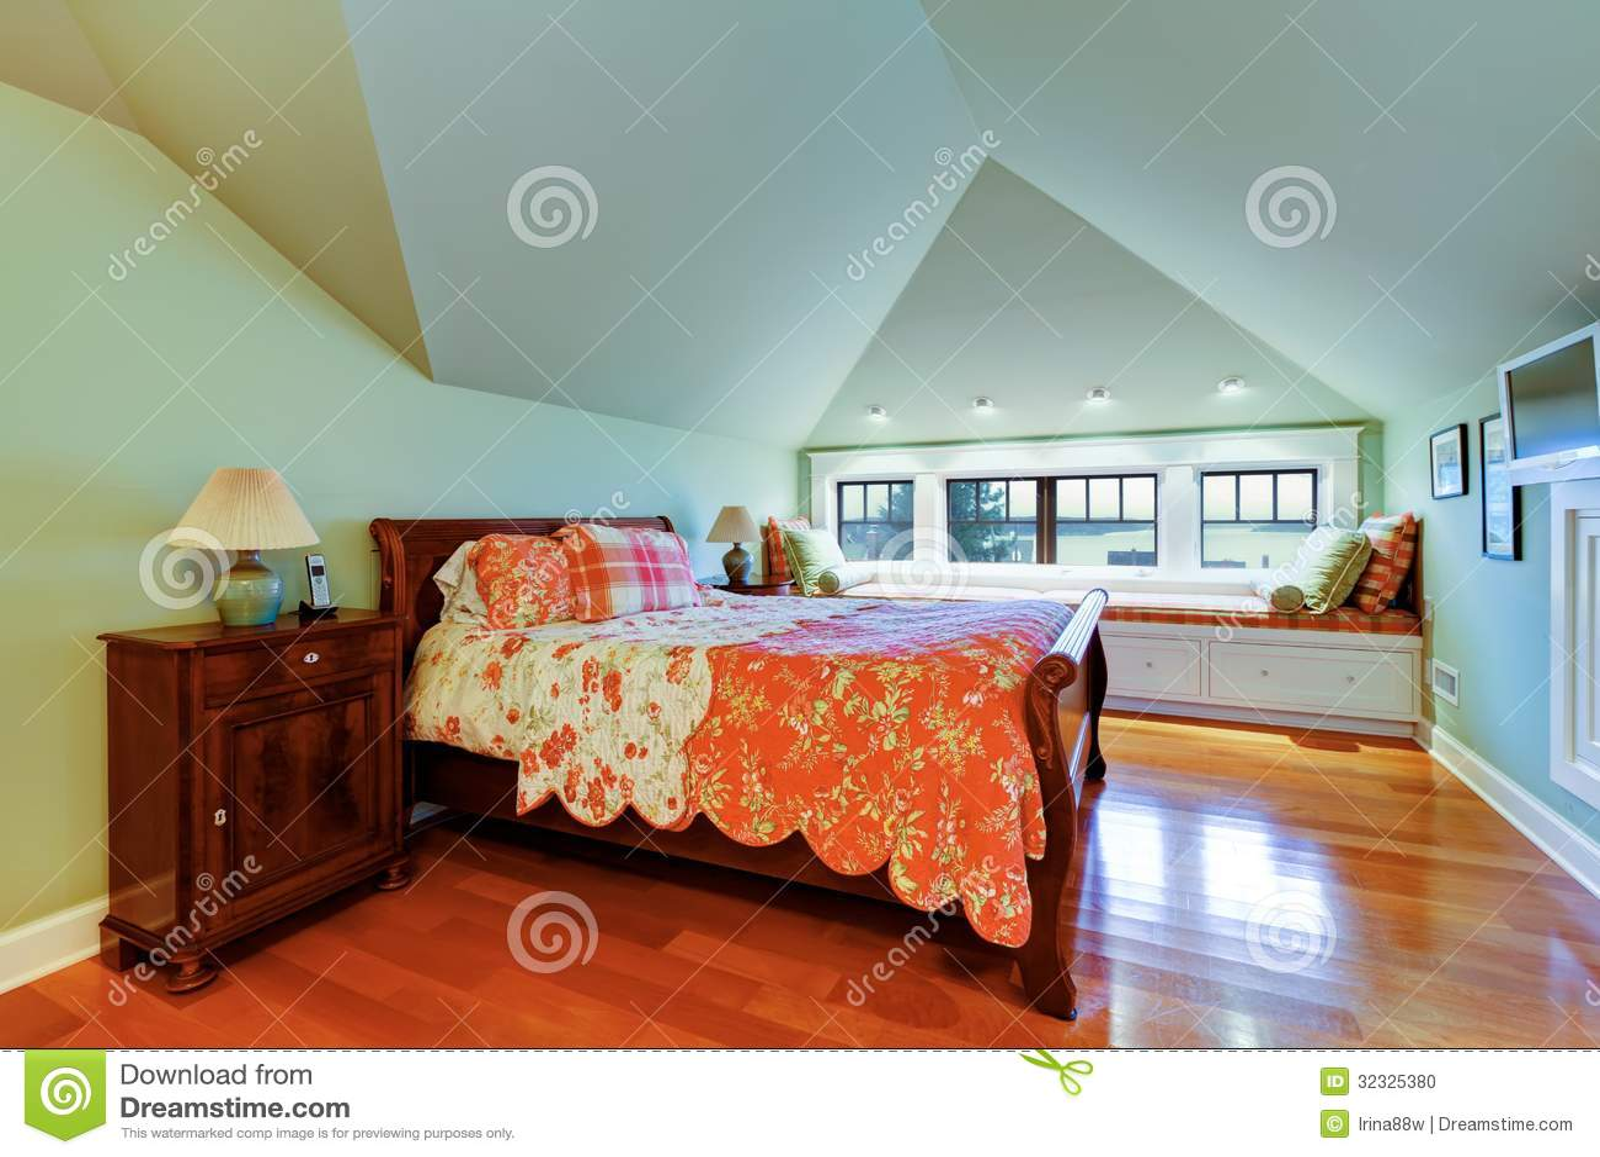 Groene slaapkamer met gewelfde plafond en vensterbank. stock foto ...